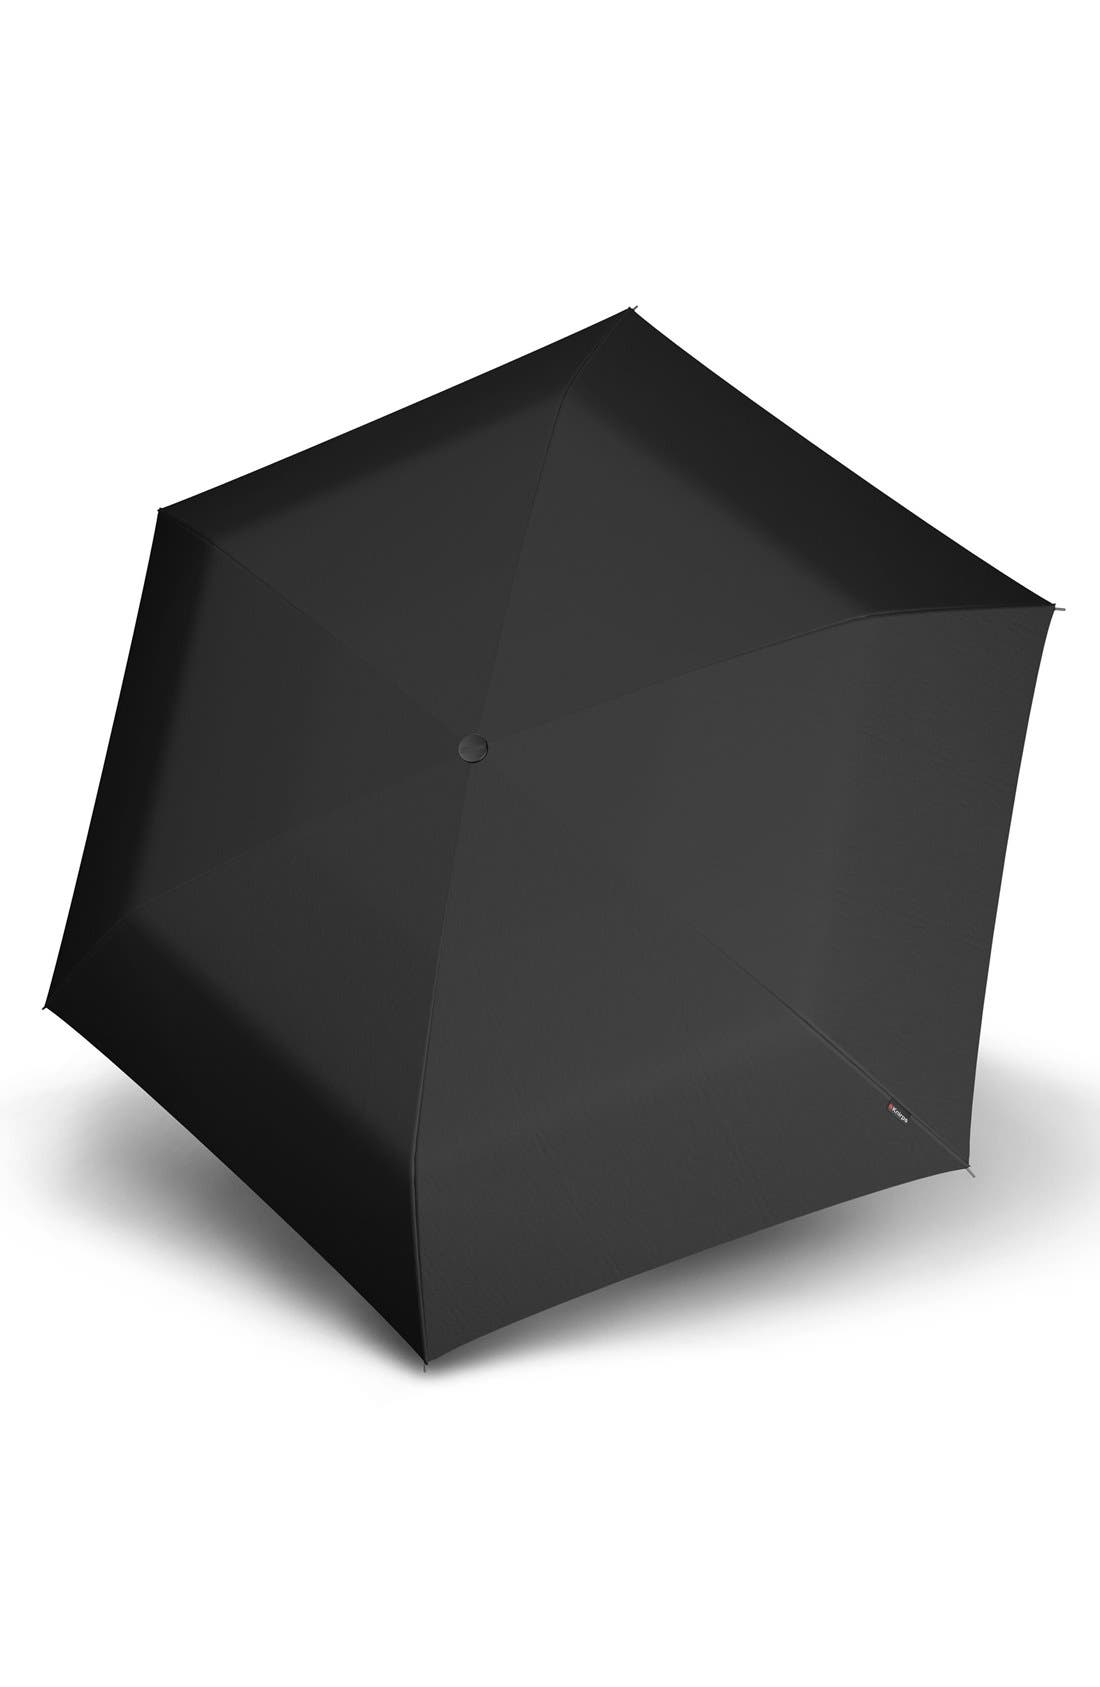 Main Image - Knirps 'Flat Duomatic' Umbrella